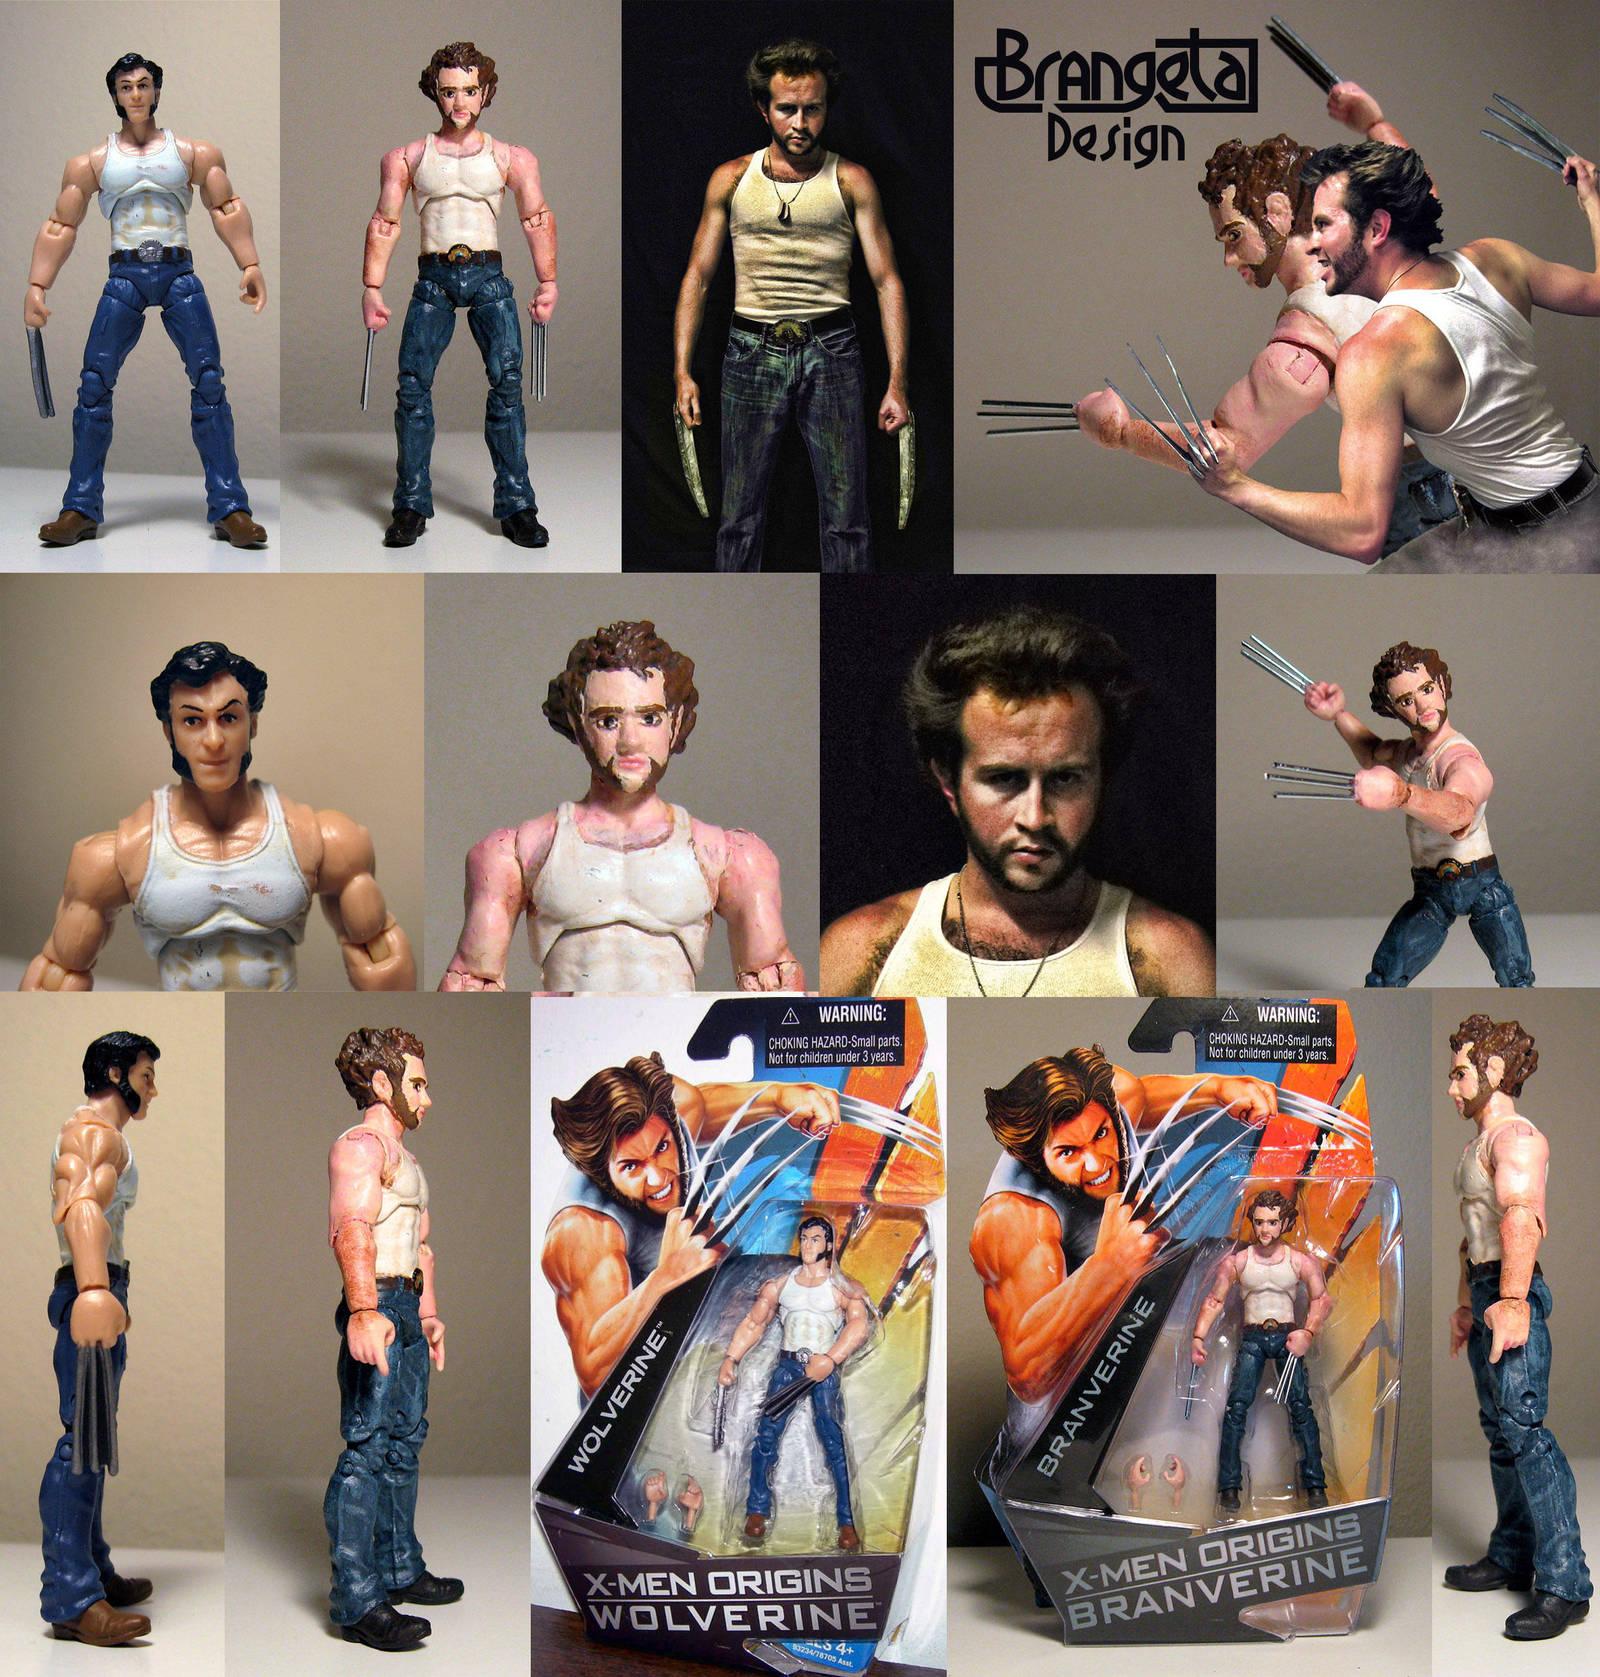 Wolverine X-men Origins Custom Figure Halloween by Brangeta